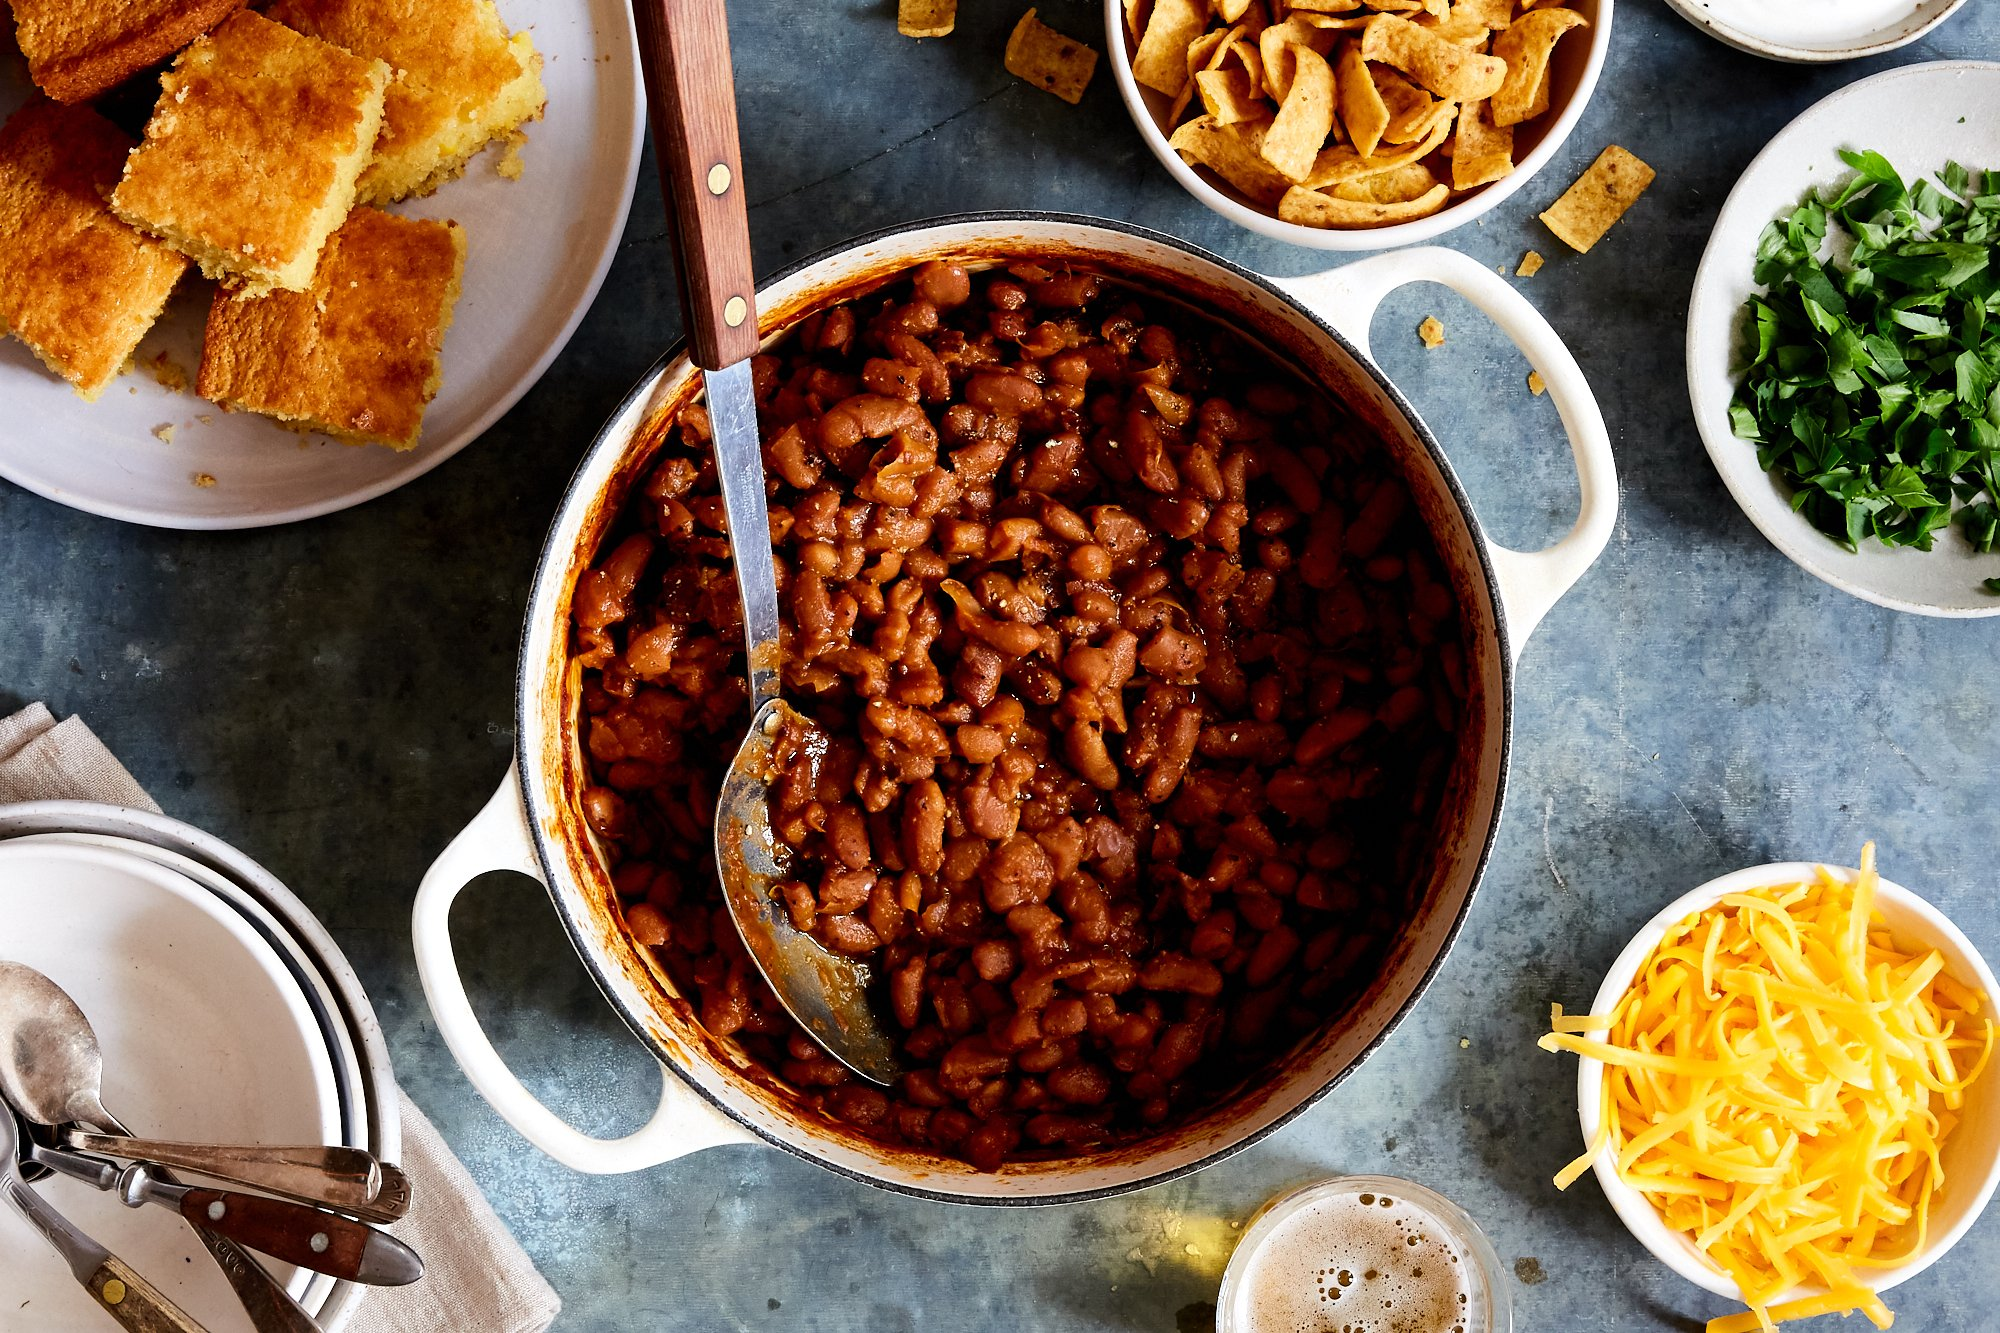 Self-Serve Baked Beans